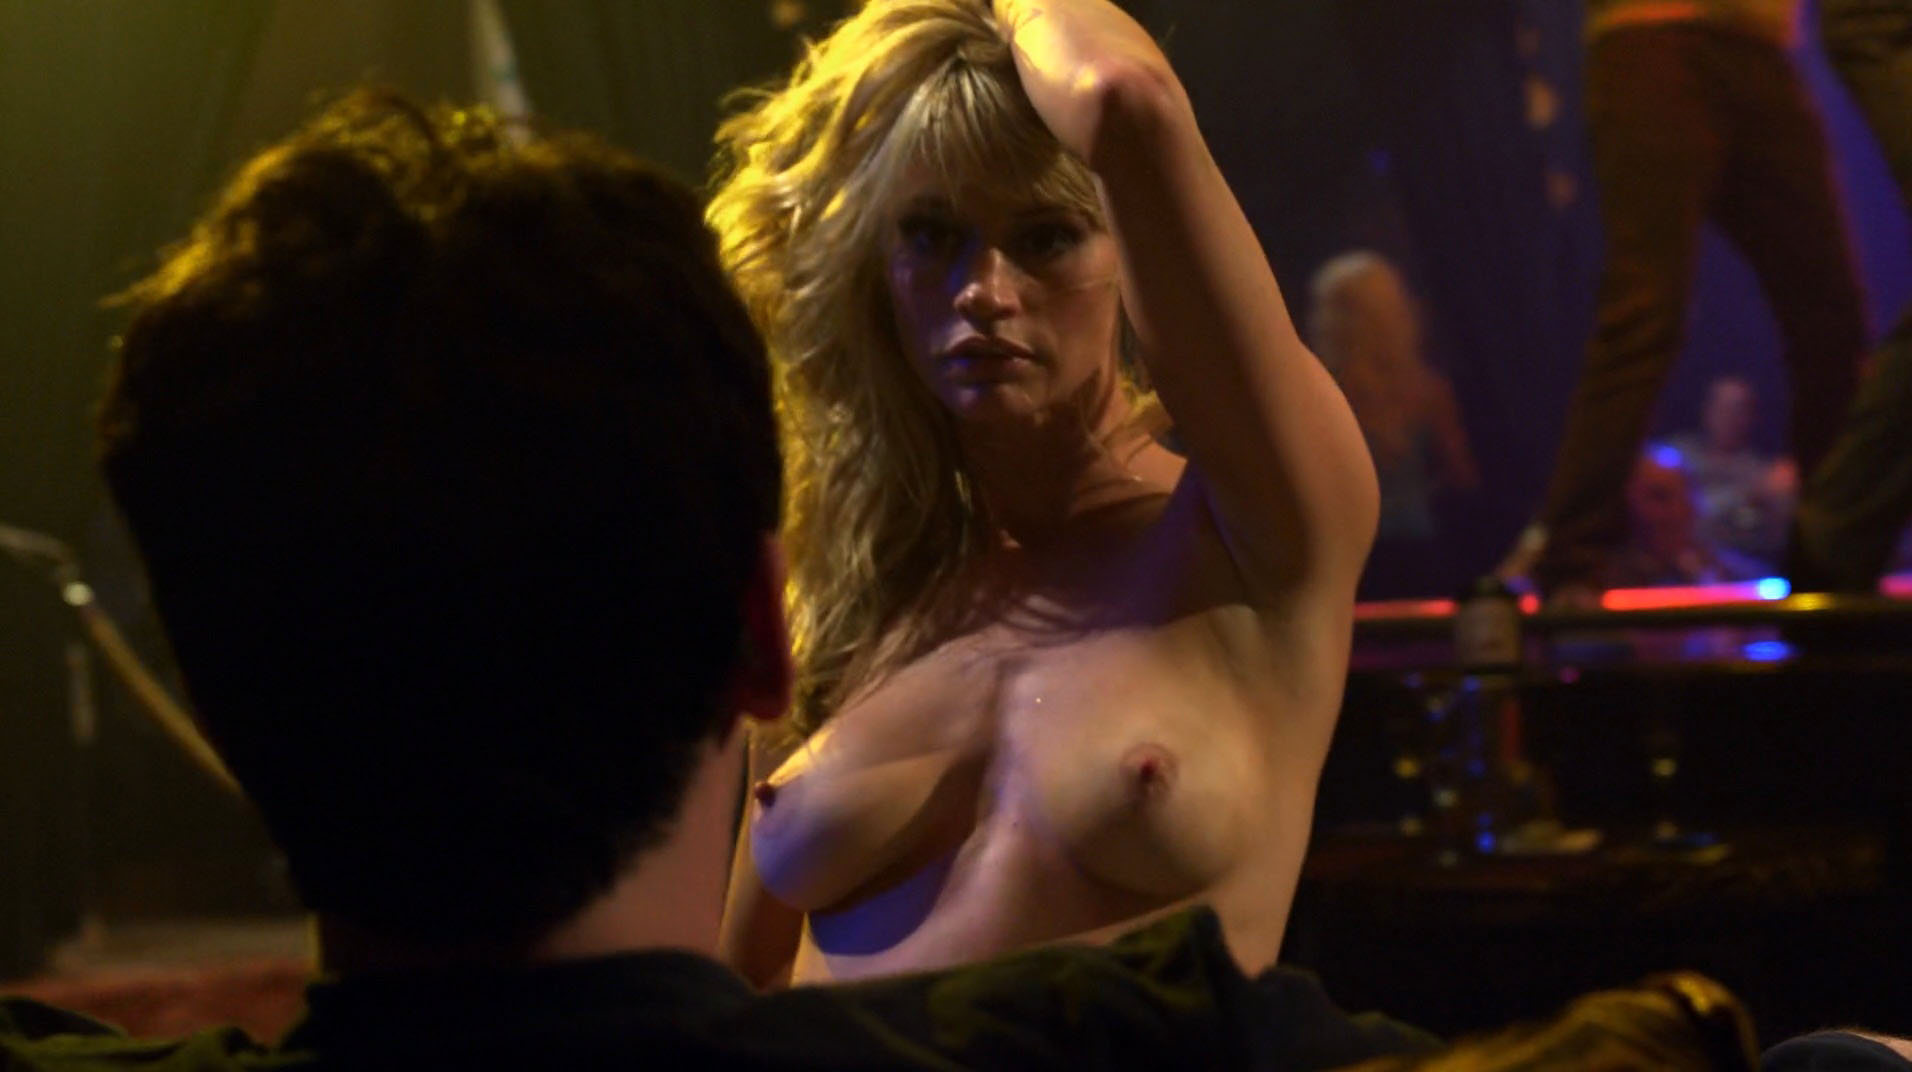 Cameron richardson nude remarkable